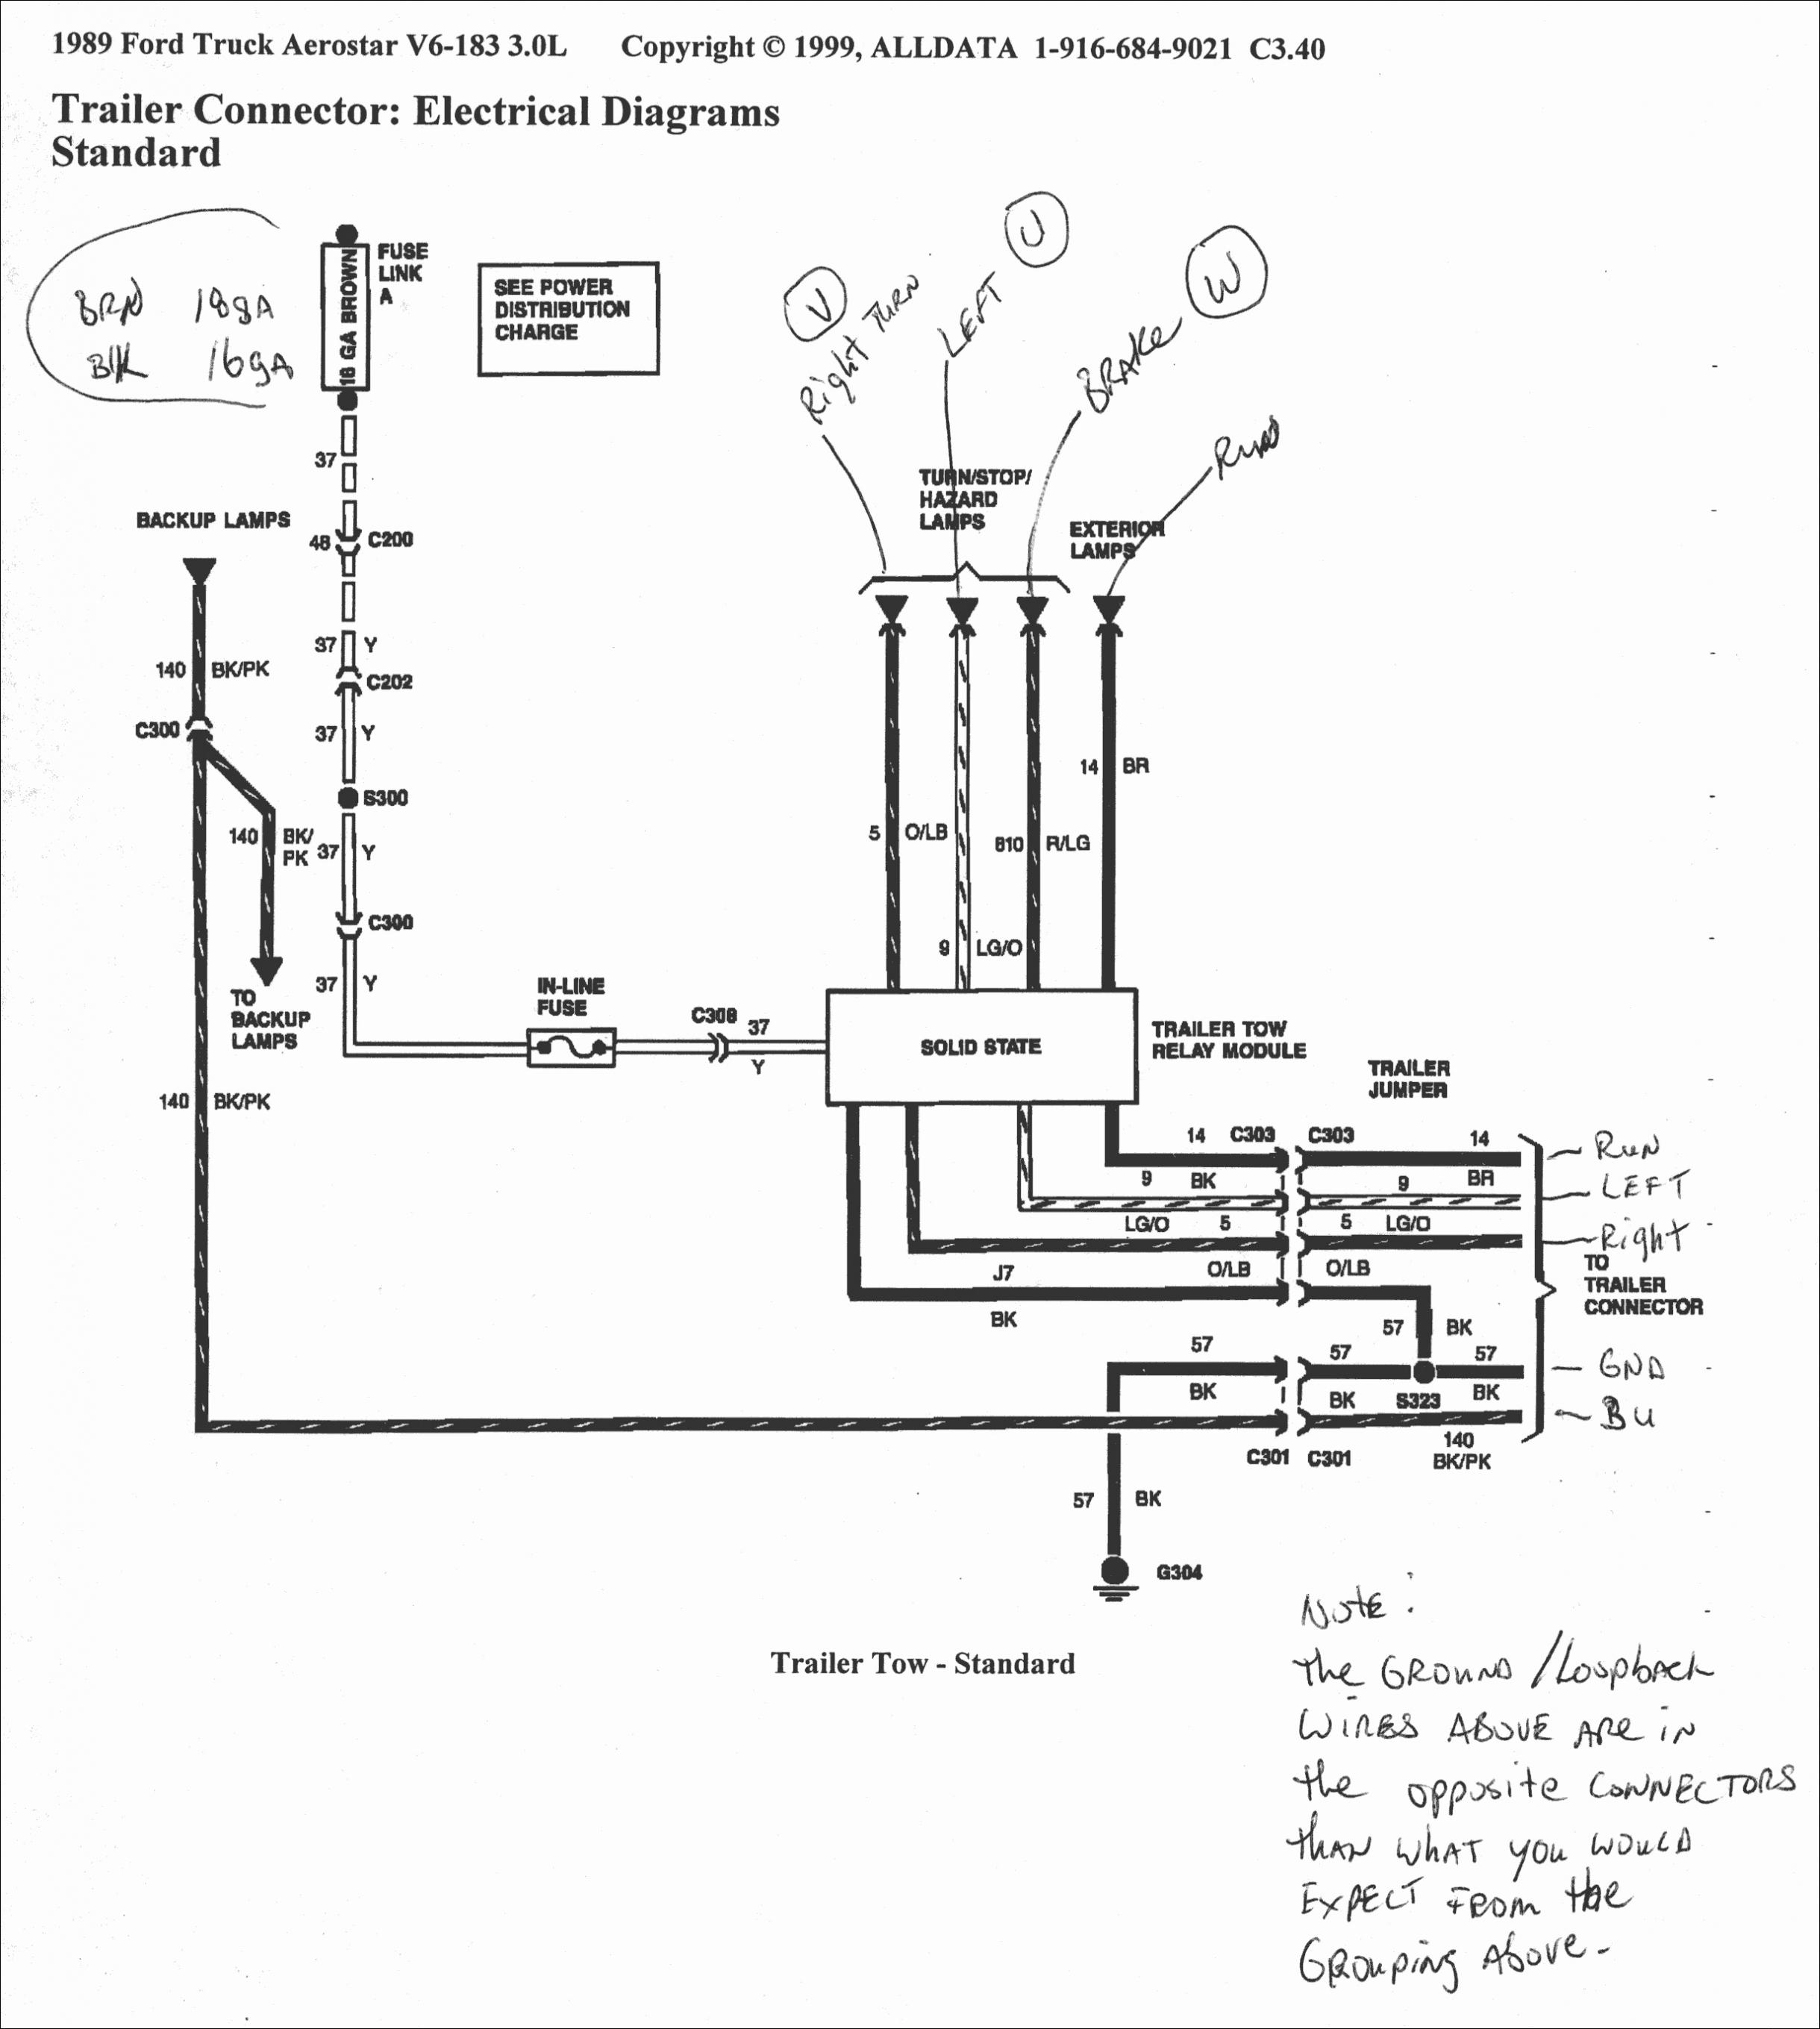 Ford F150 Radio Wiring Harness Diagram — Daytonva150 - Ford Radio Wiring Diagram Download